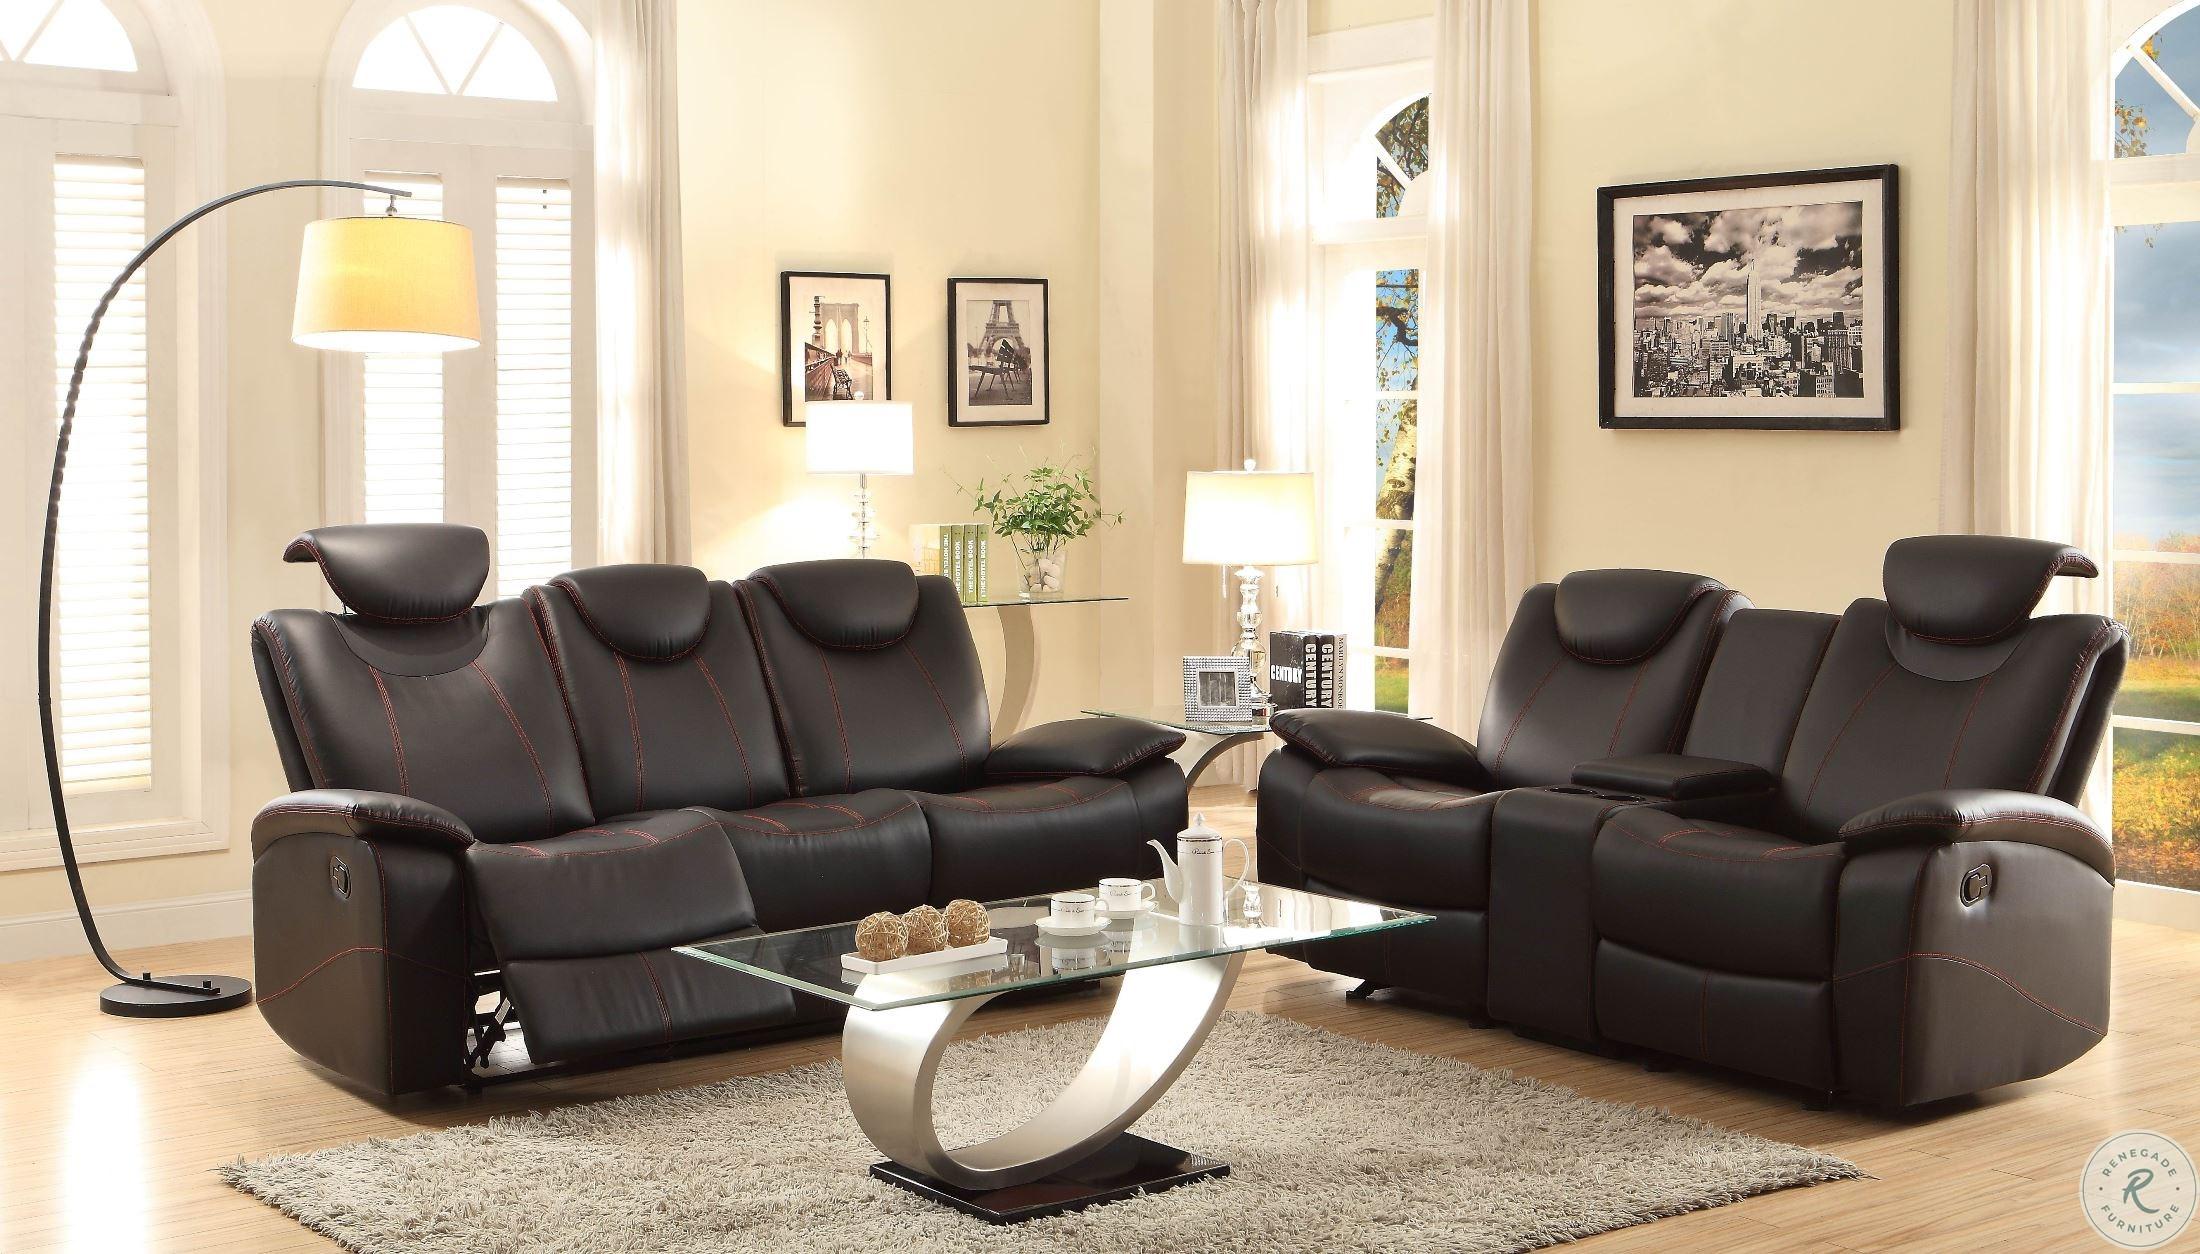 Peachy Talbot Black Double Glider Reclining Loveseat With Console Inzonedesignstudio Interior Chair Design Inzonedesignstudiocom